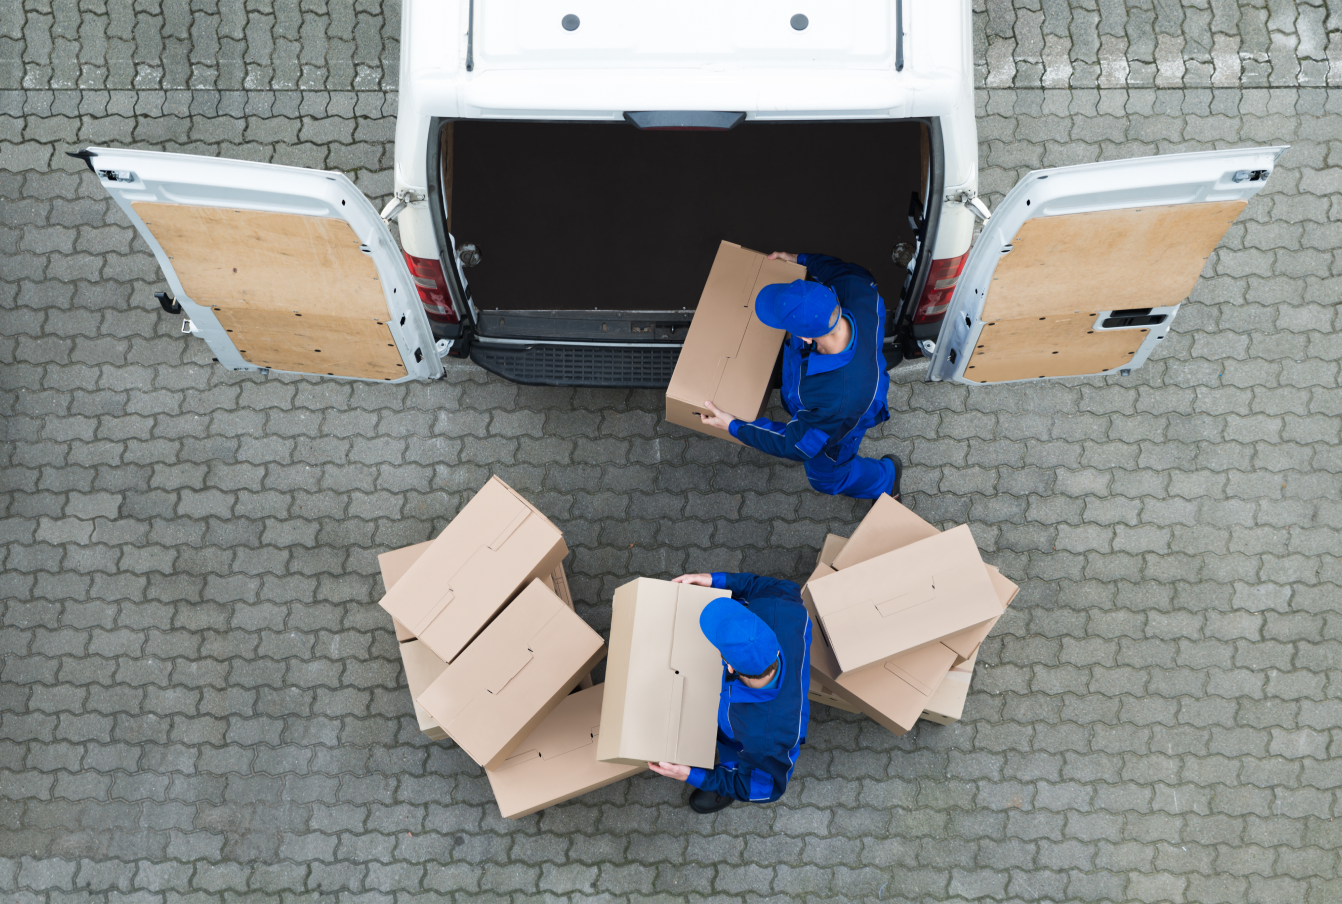 Deliveries have variable carbon footprints